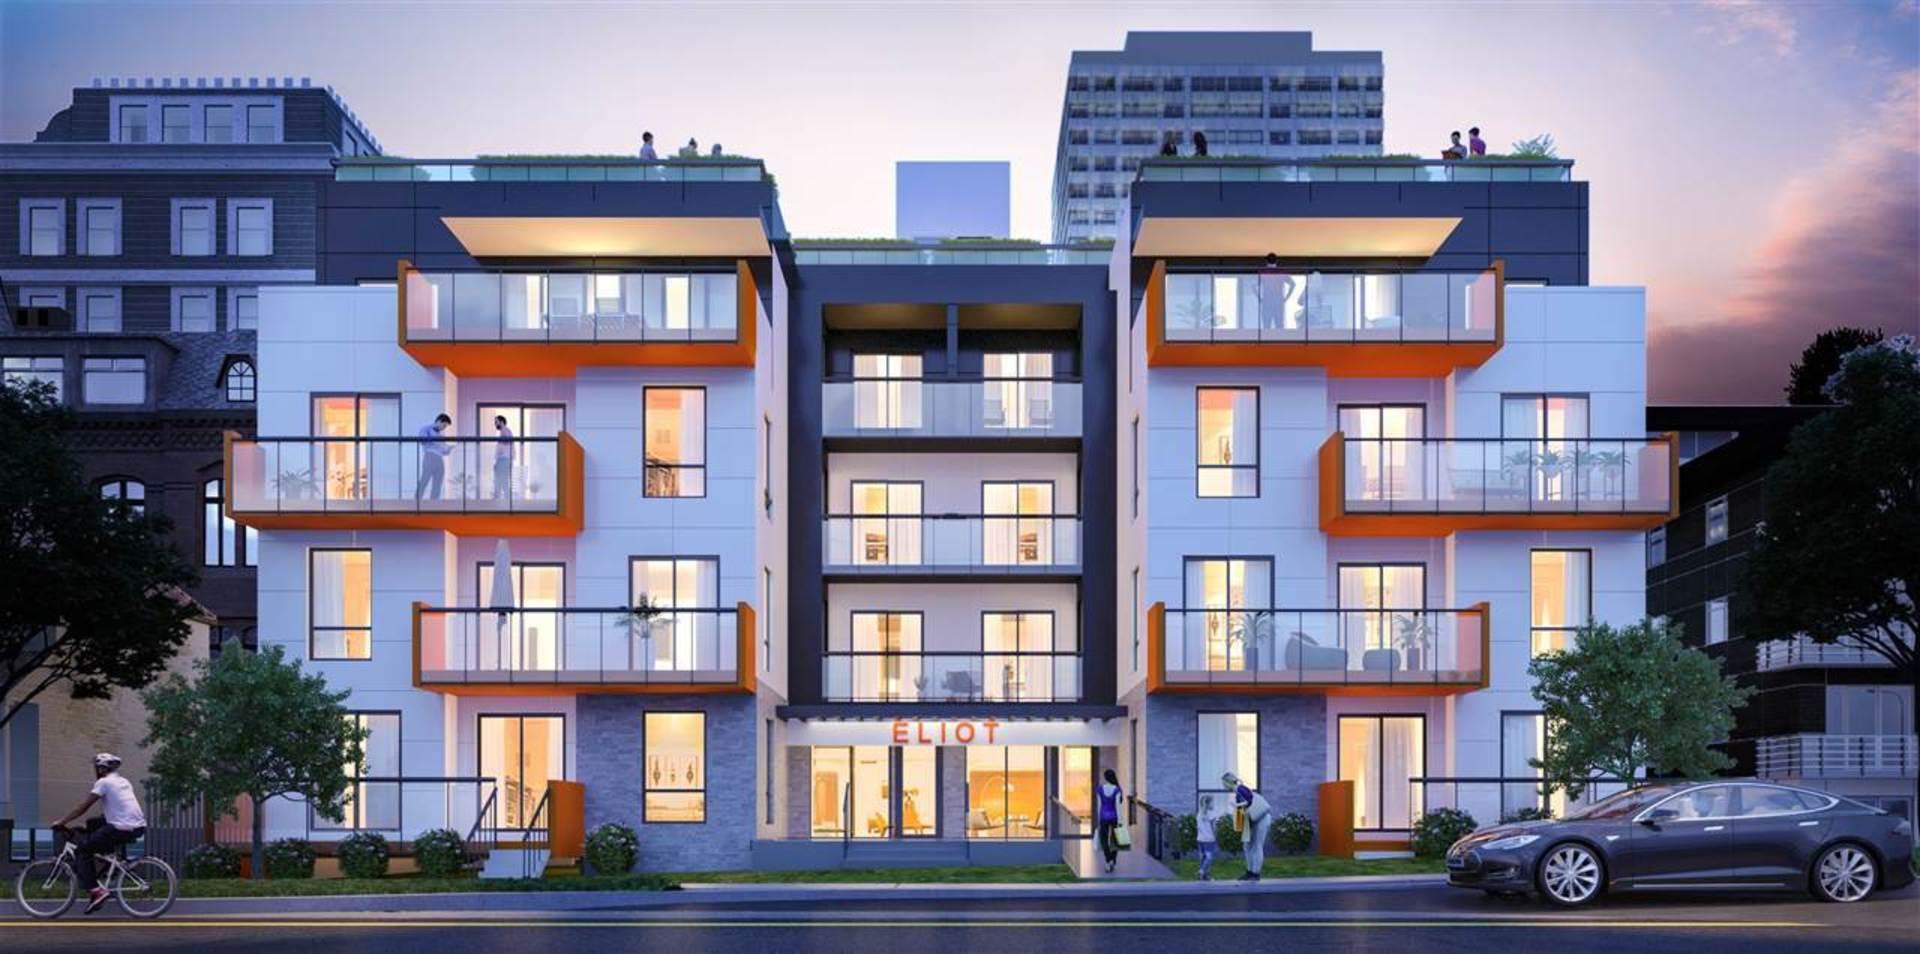 2688-duke-street-collingwood-ve-vancouver-east-01 at